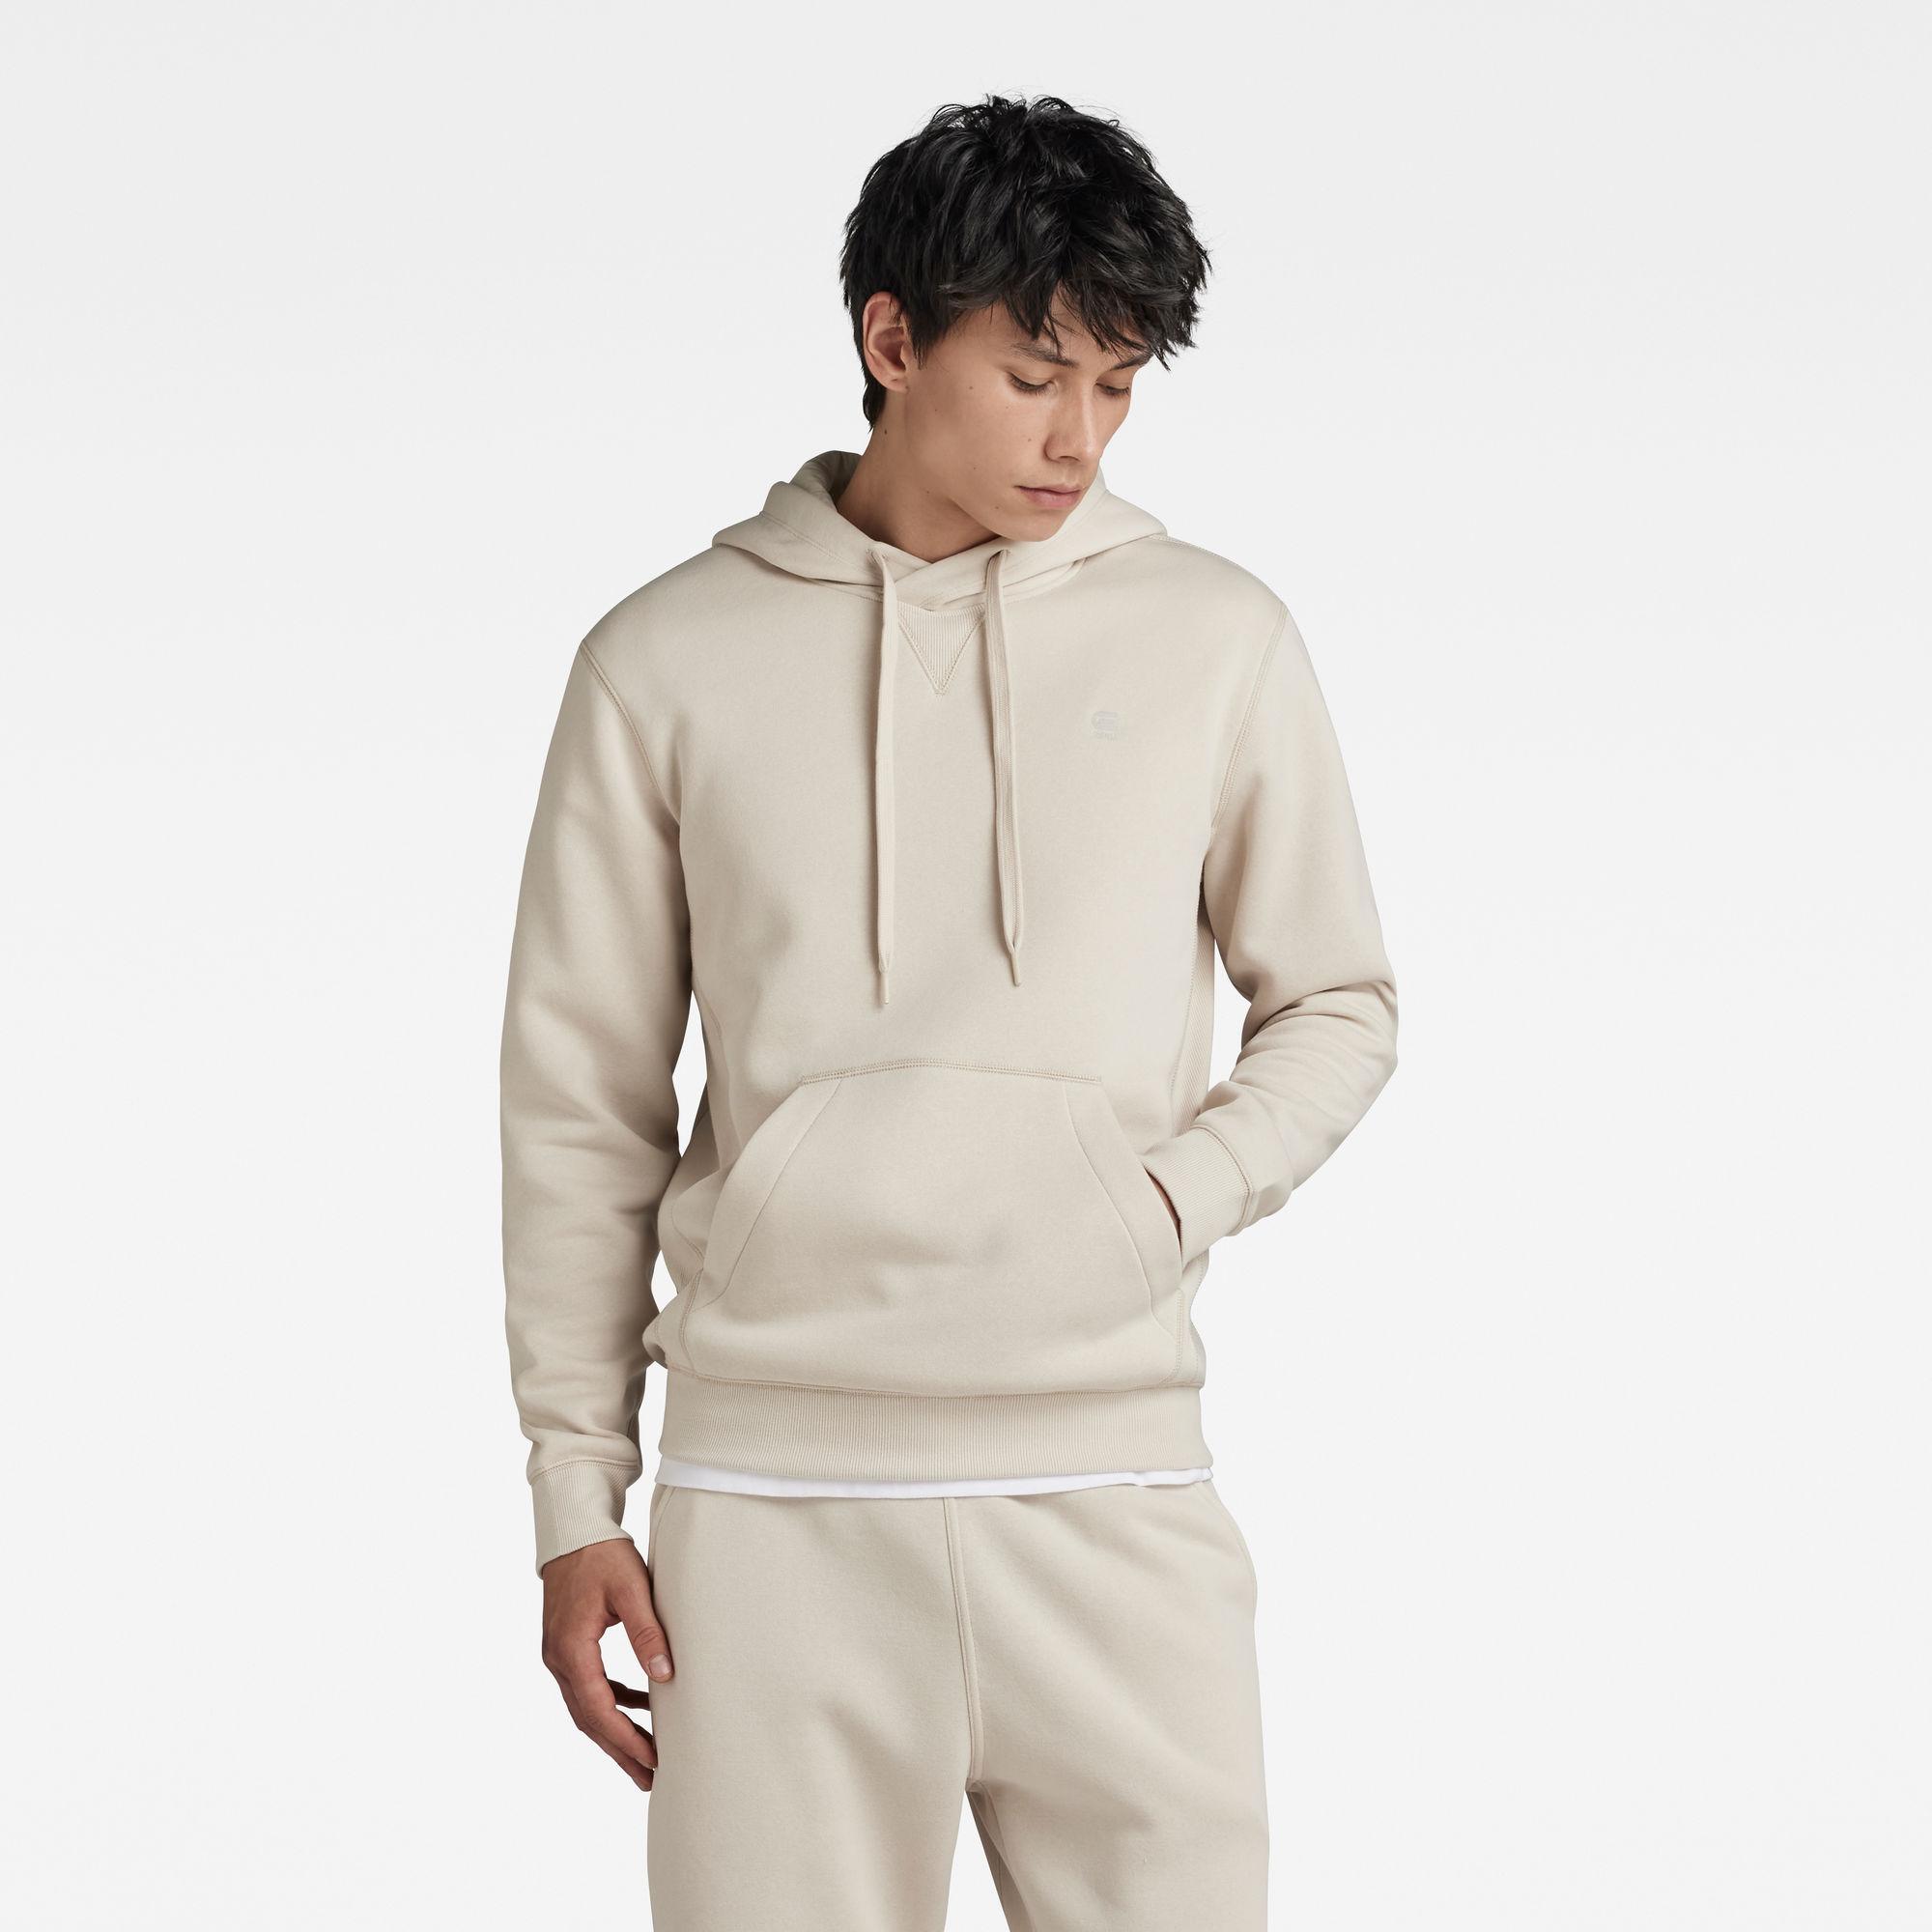 G-Star RAW Heren Premium Core Hooded Sweater Beige